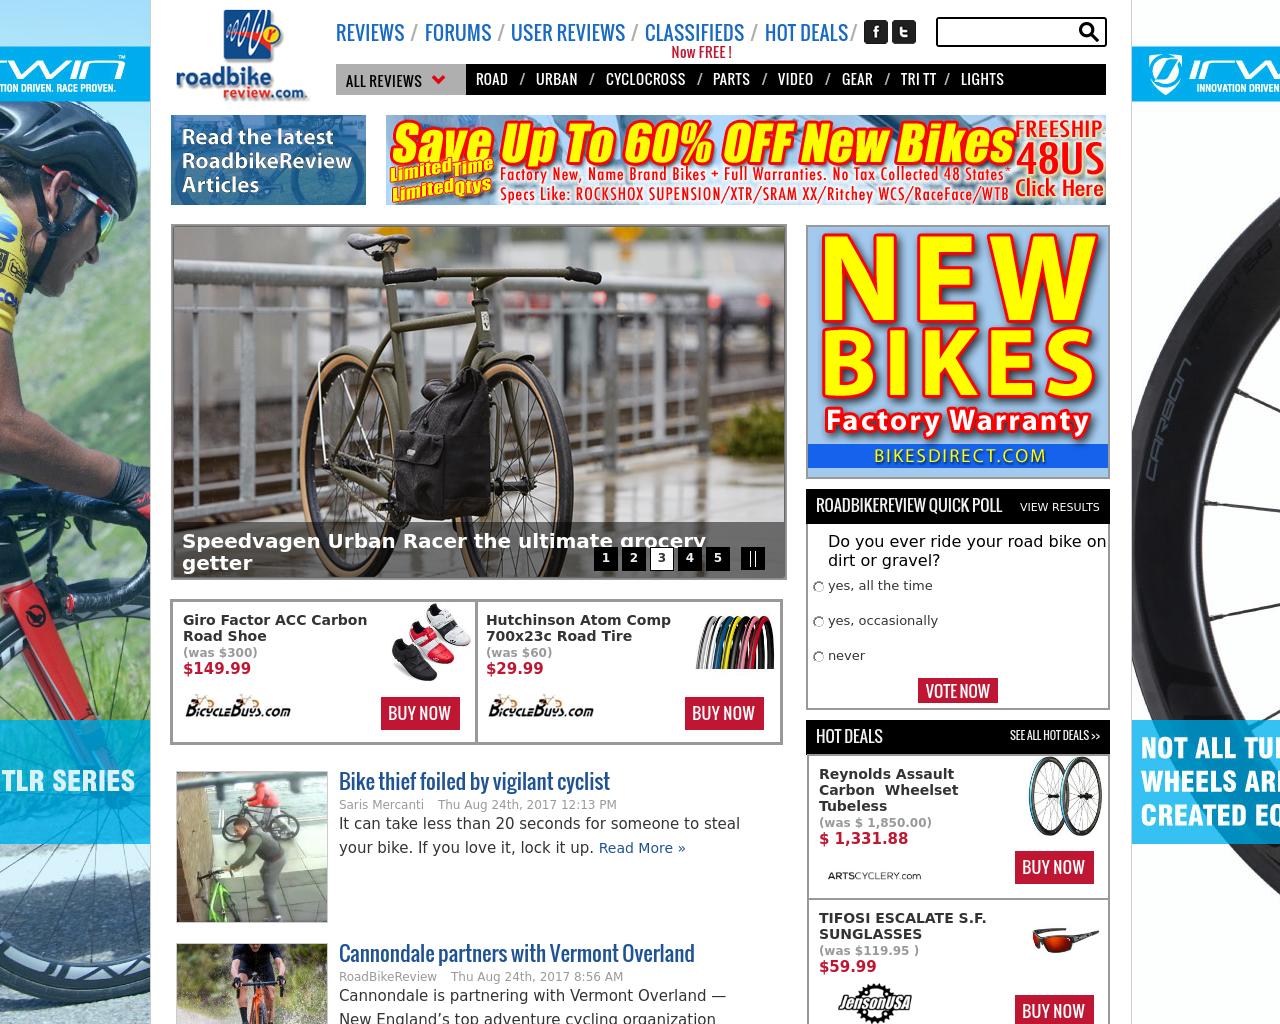 Road-Bike-Review-Advertising-Reviews-Pricing